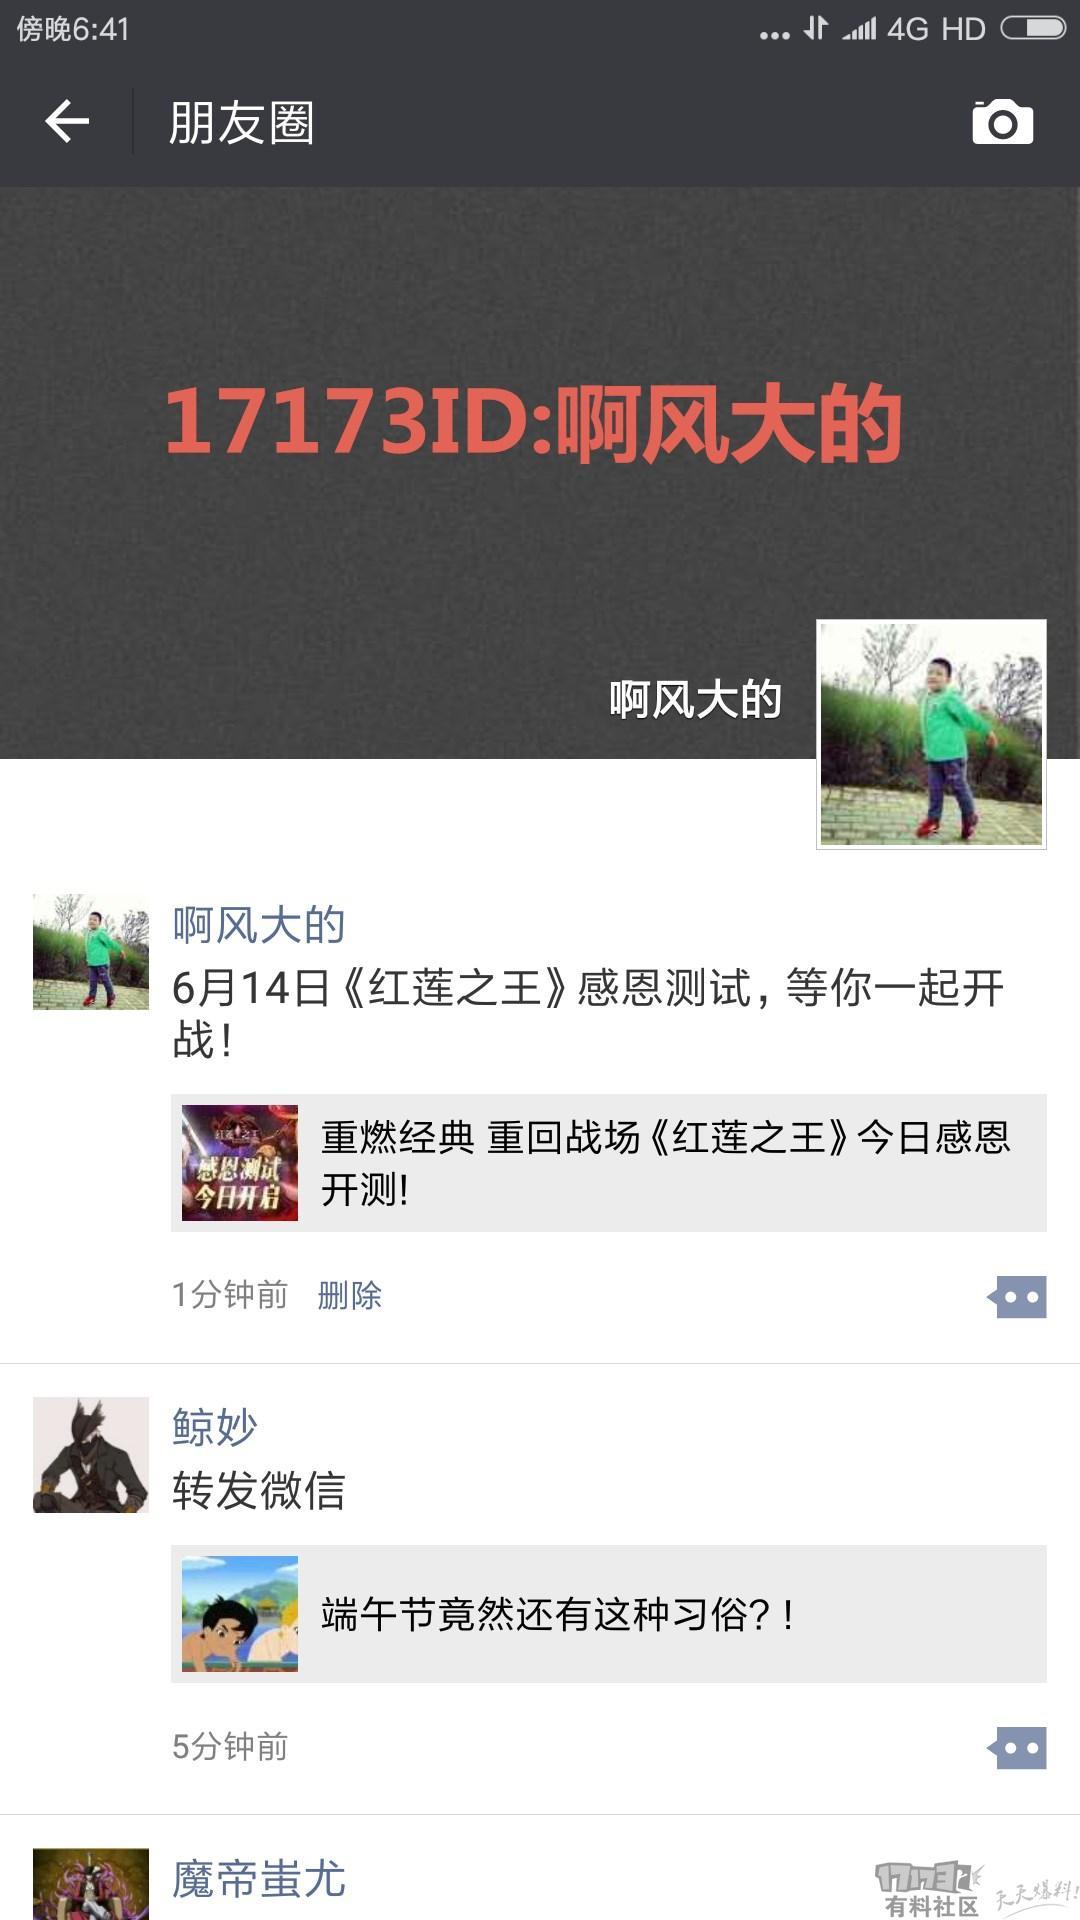 Screenshot_2018-06-14-18-41-12-375_com.tencent.mm_副本.jpg